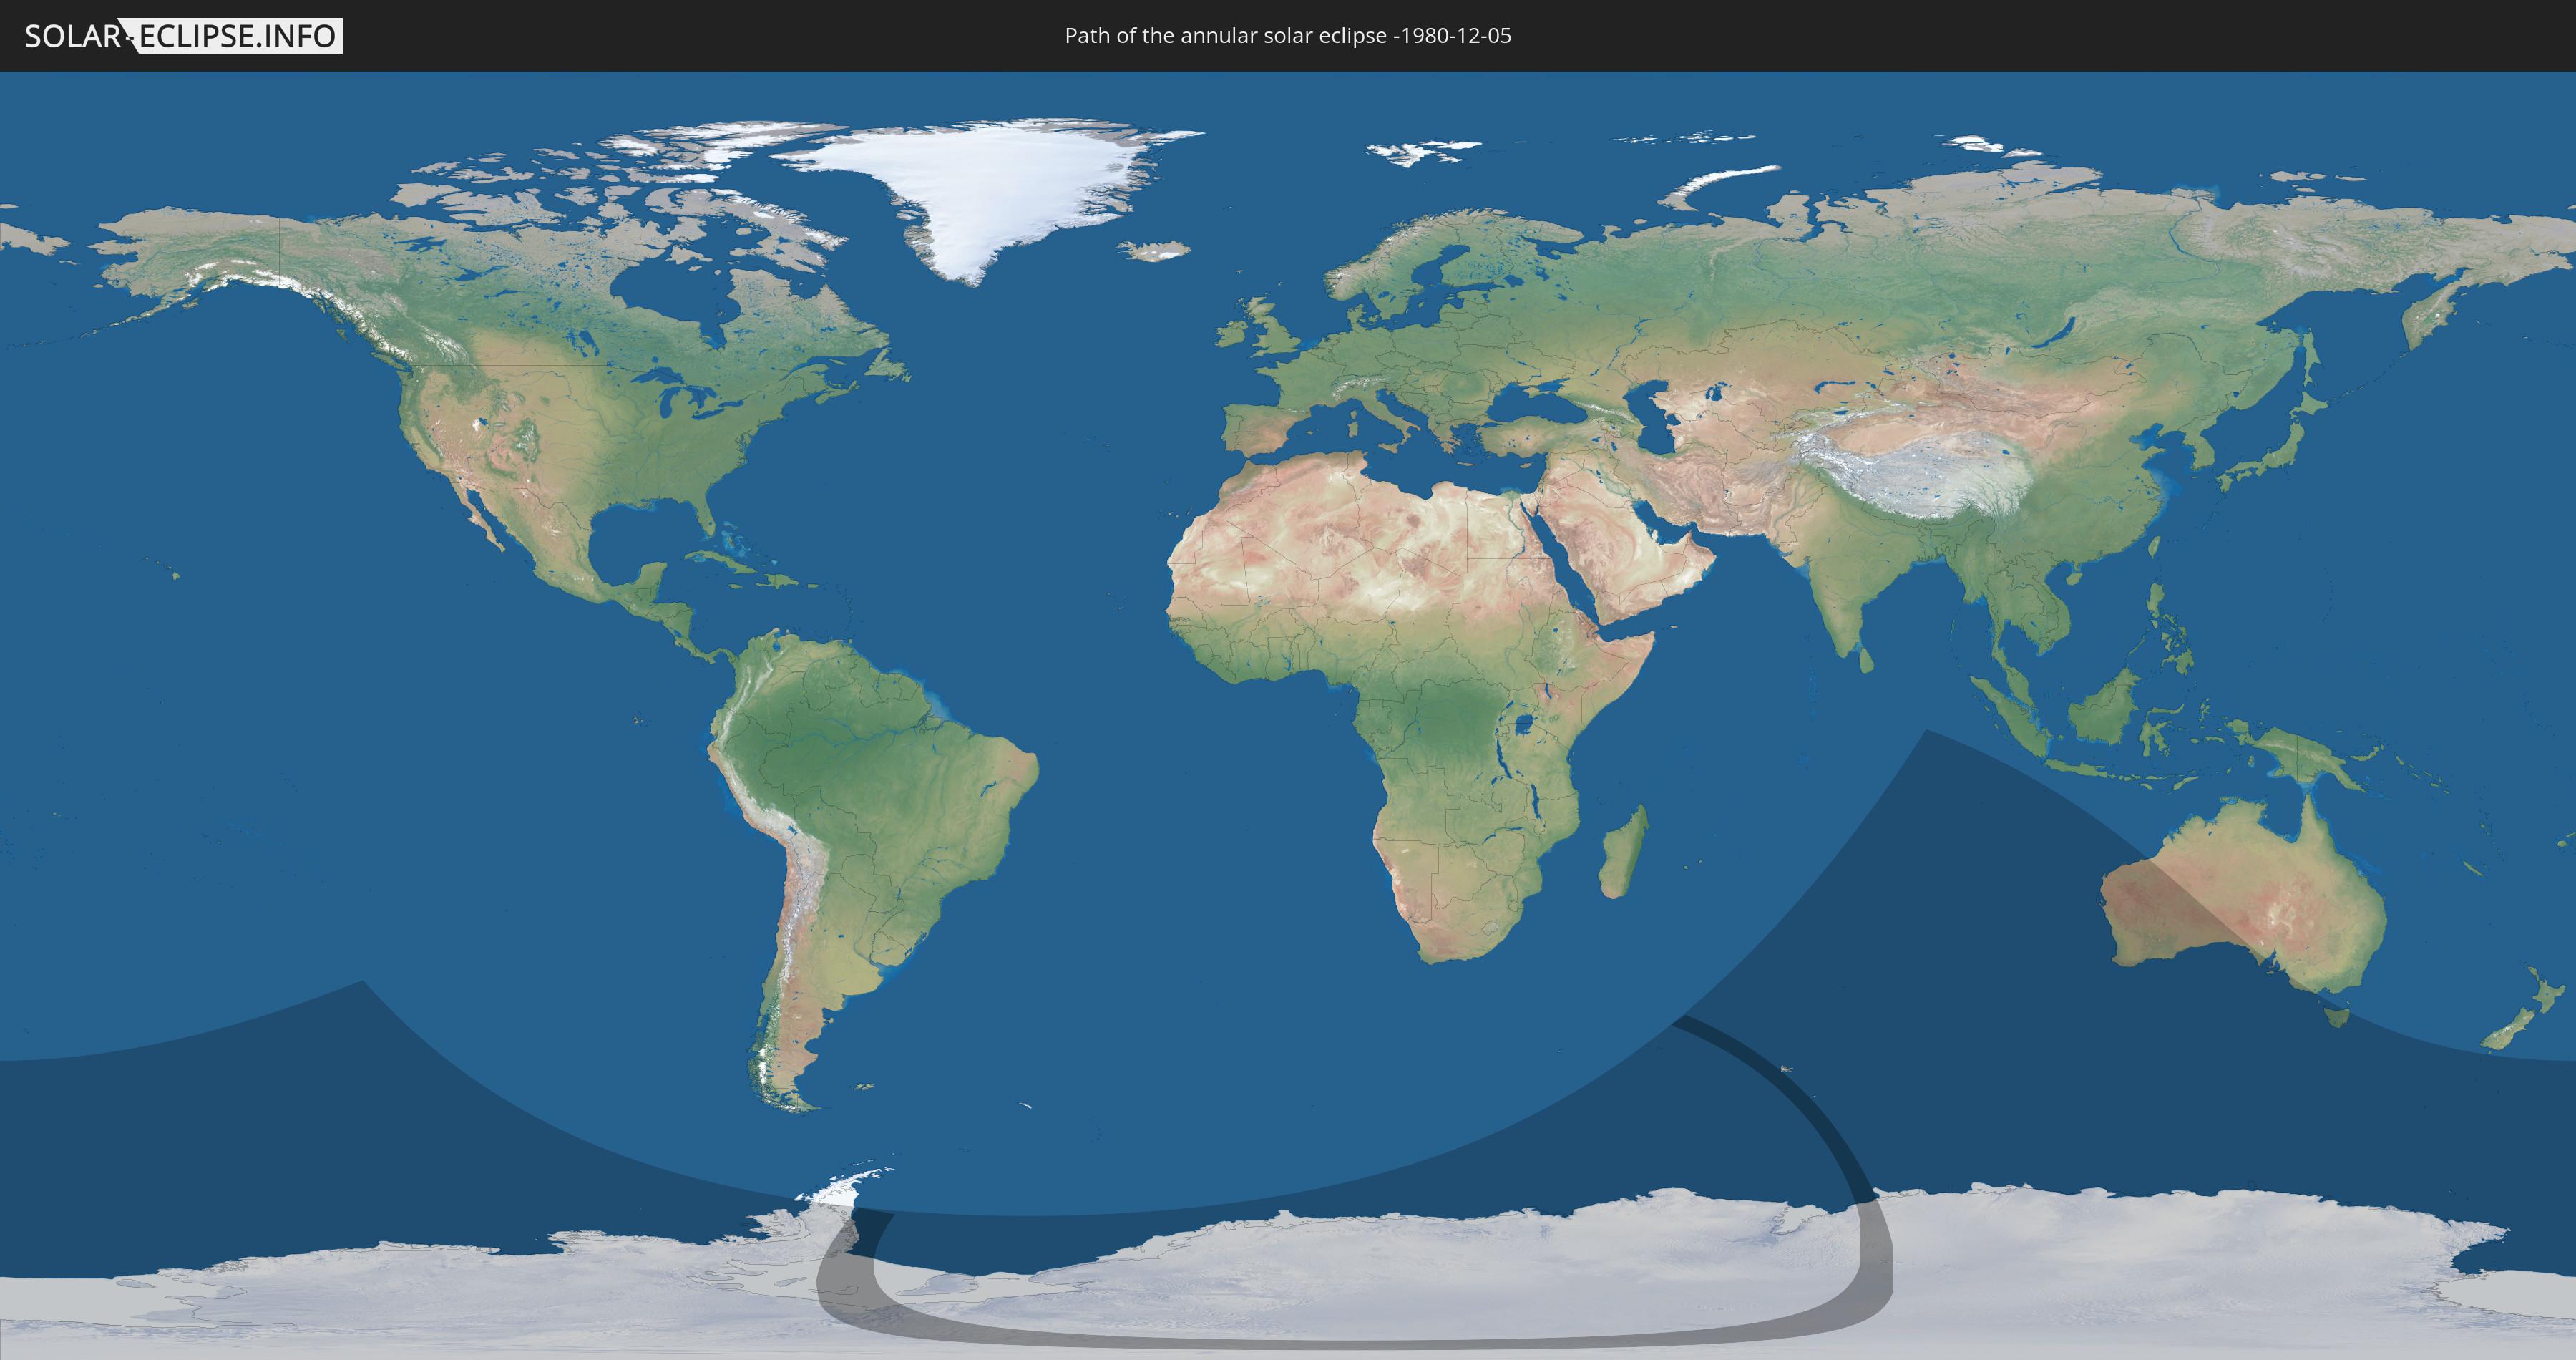 Annular solar eclipse of 12/05/-1980